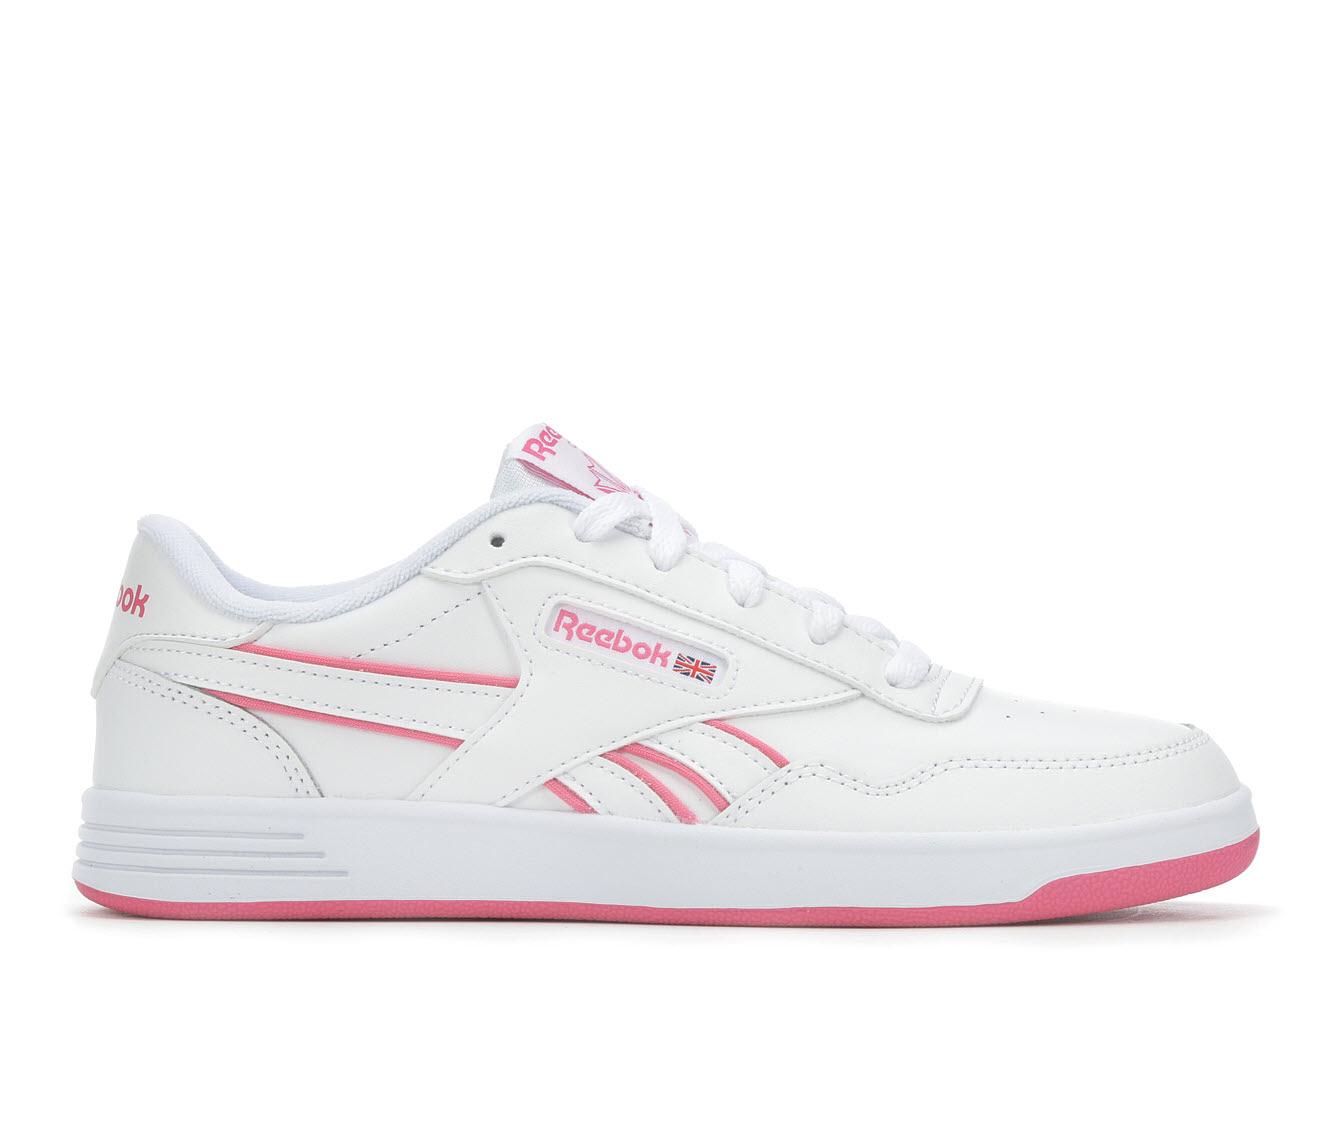 Reebok Club MEMT Women's Athletic Shoe (White)